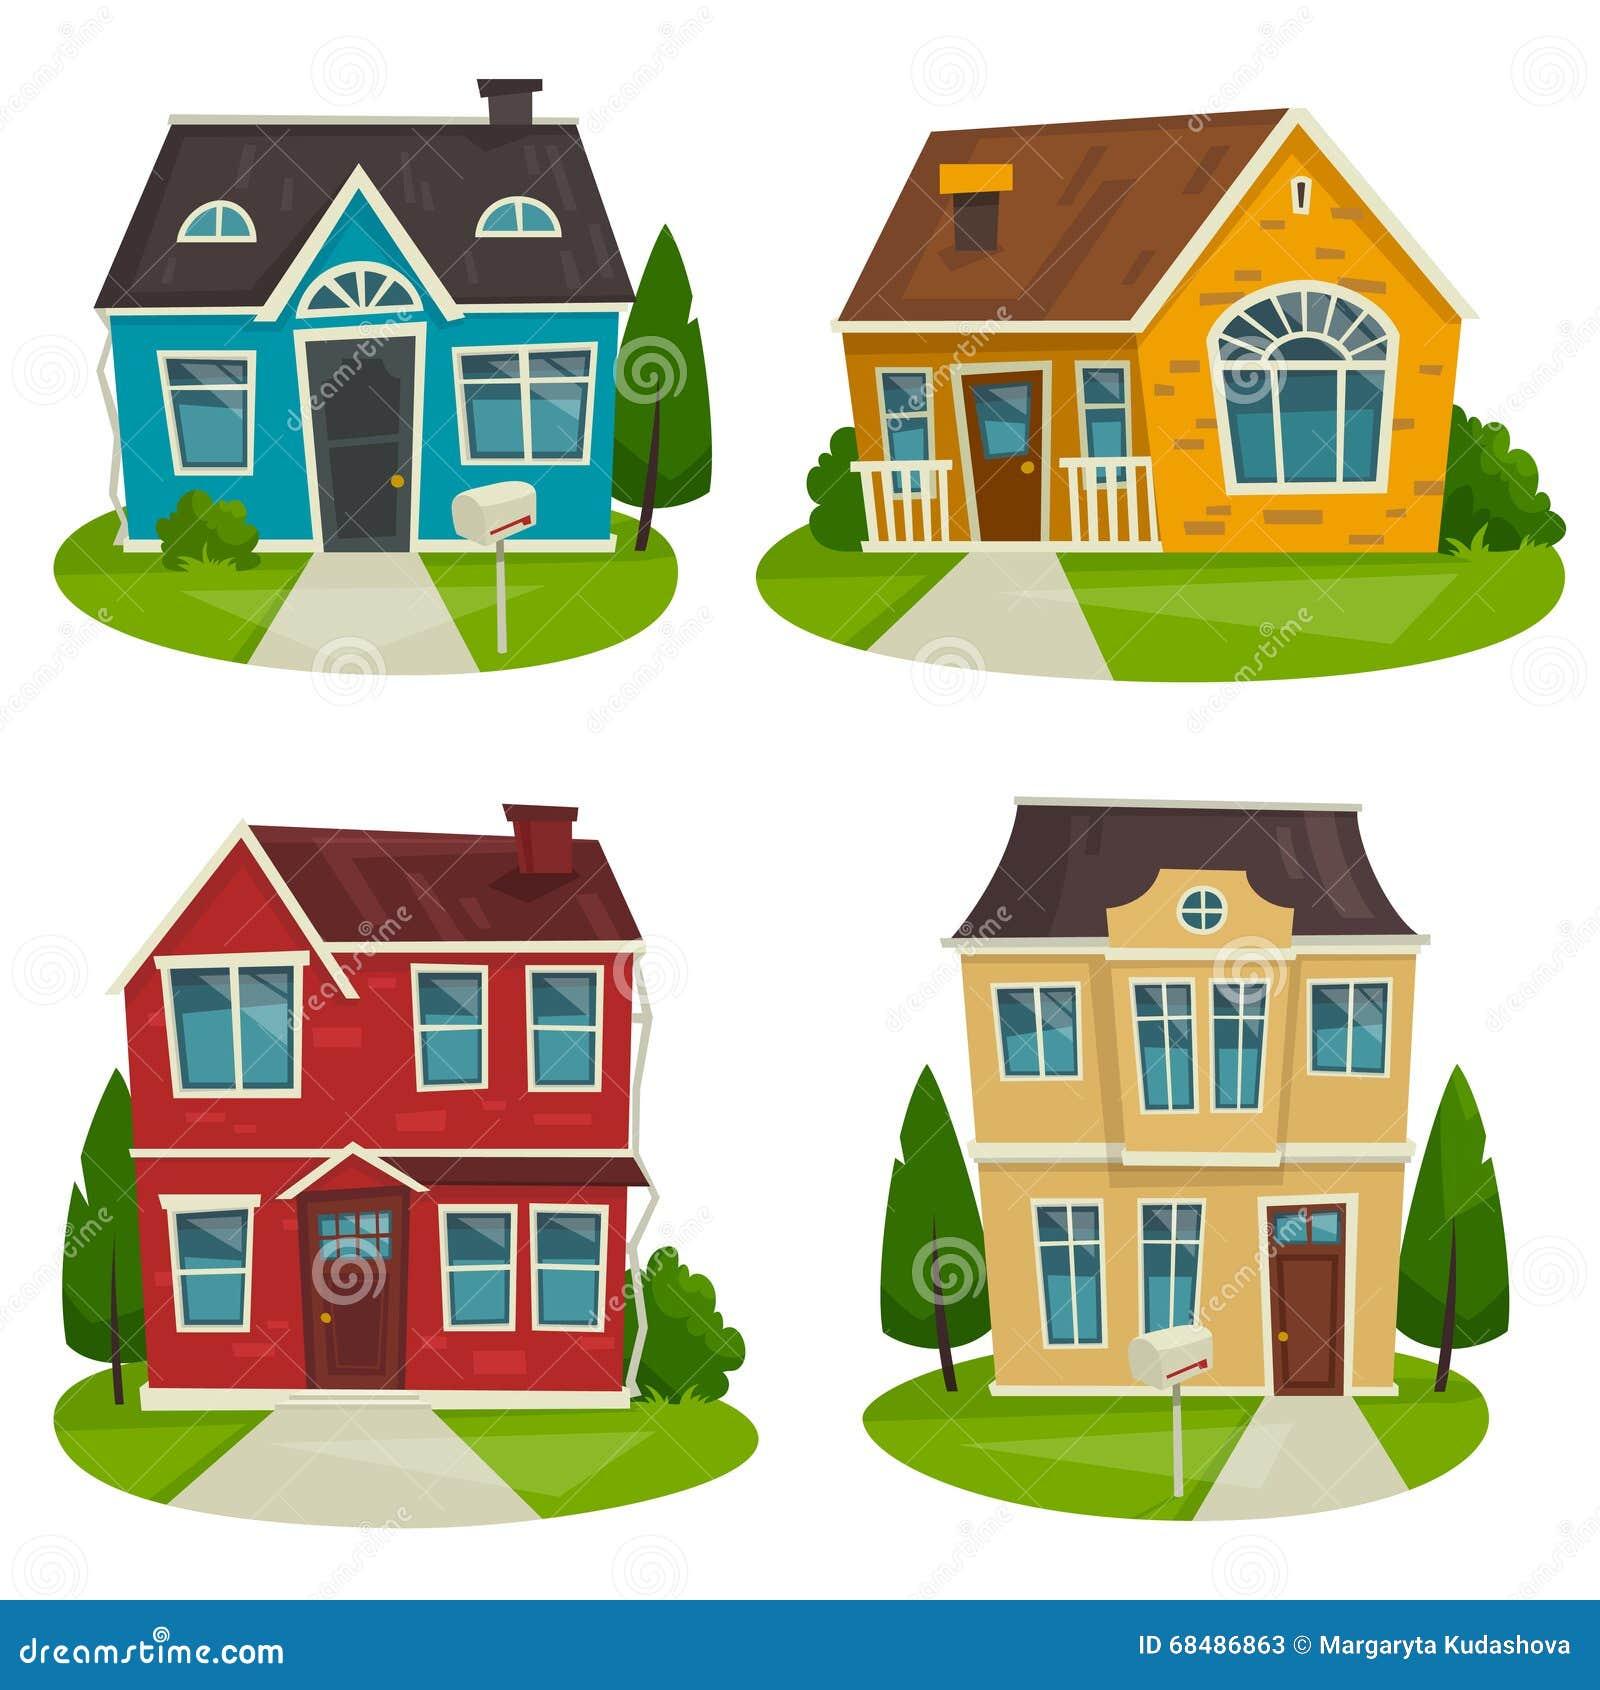 House design cartoon - Royalty Free Vector Download Houses Cottage Set Vector Cartoon Illustration Exterior Design